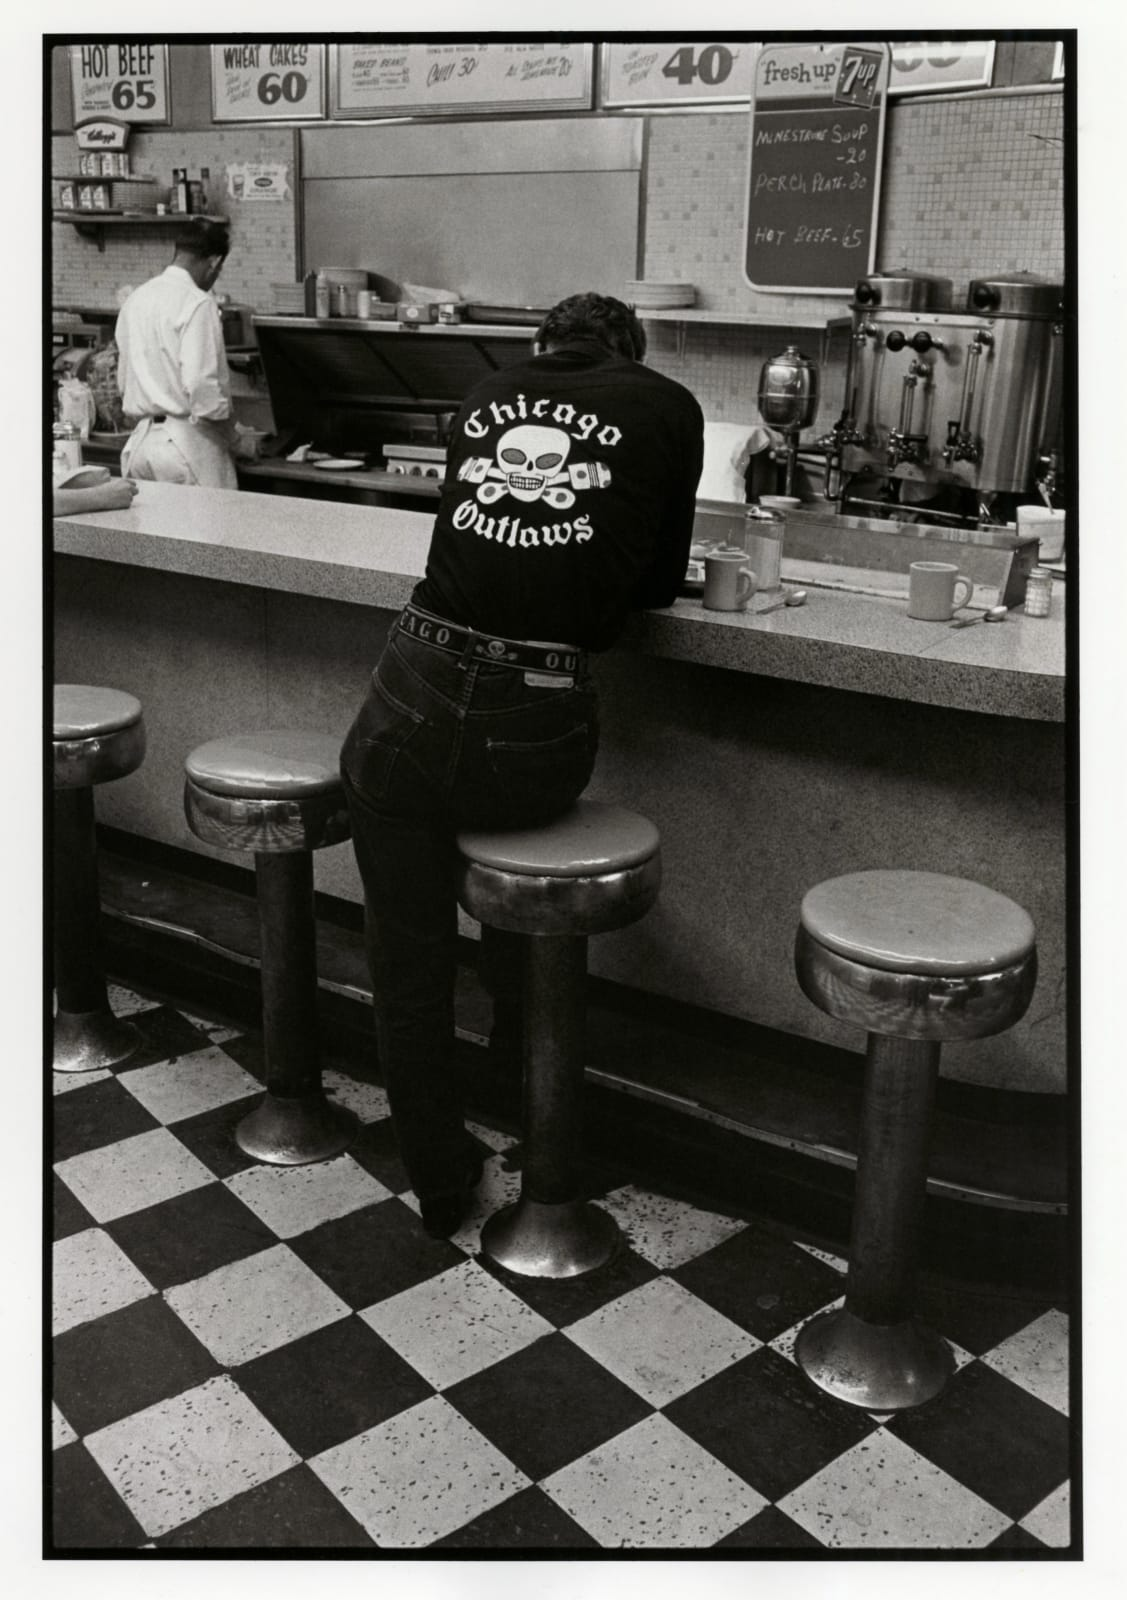 Danny Lyon - Jack, Chicago, 1965